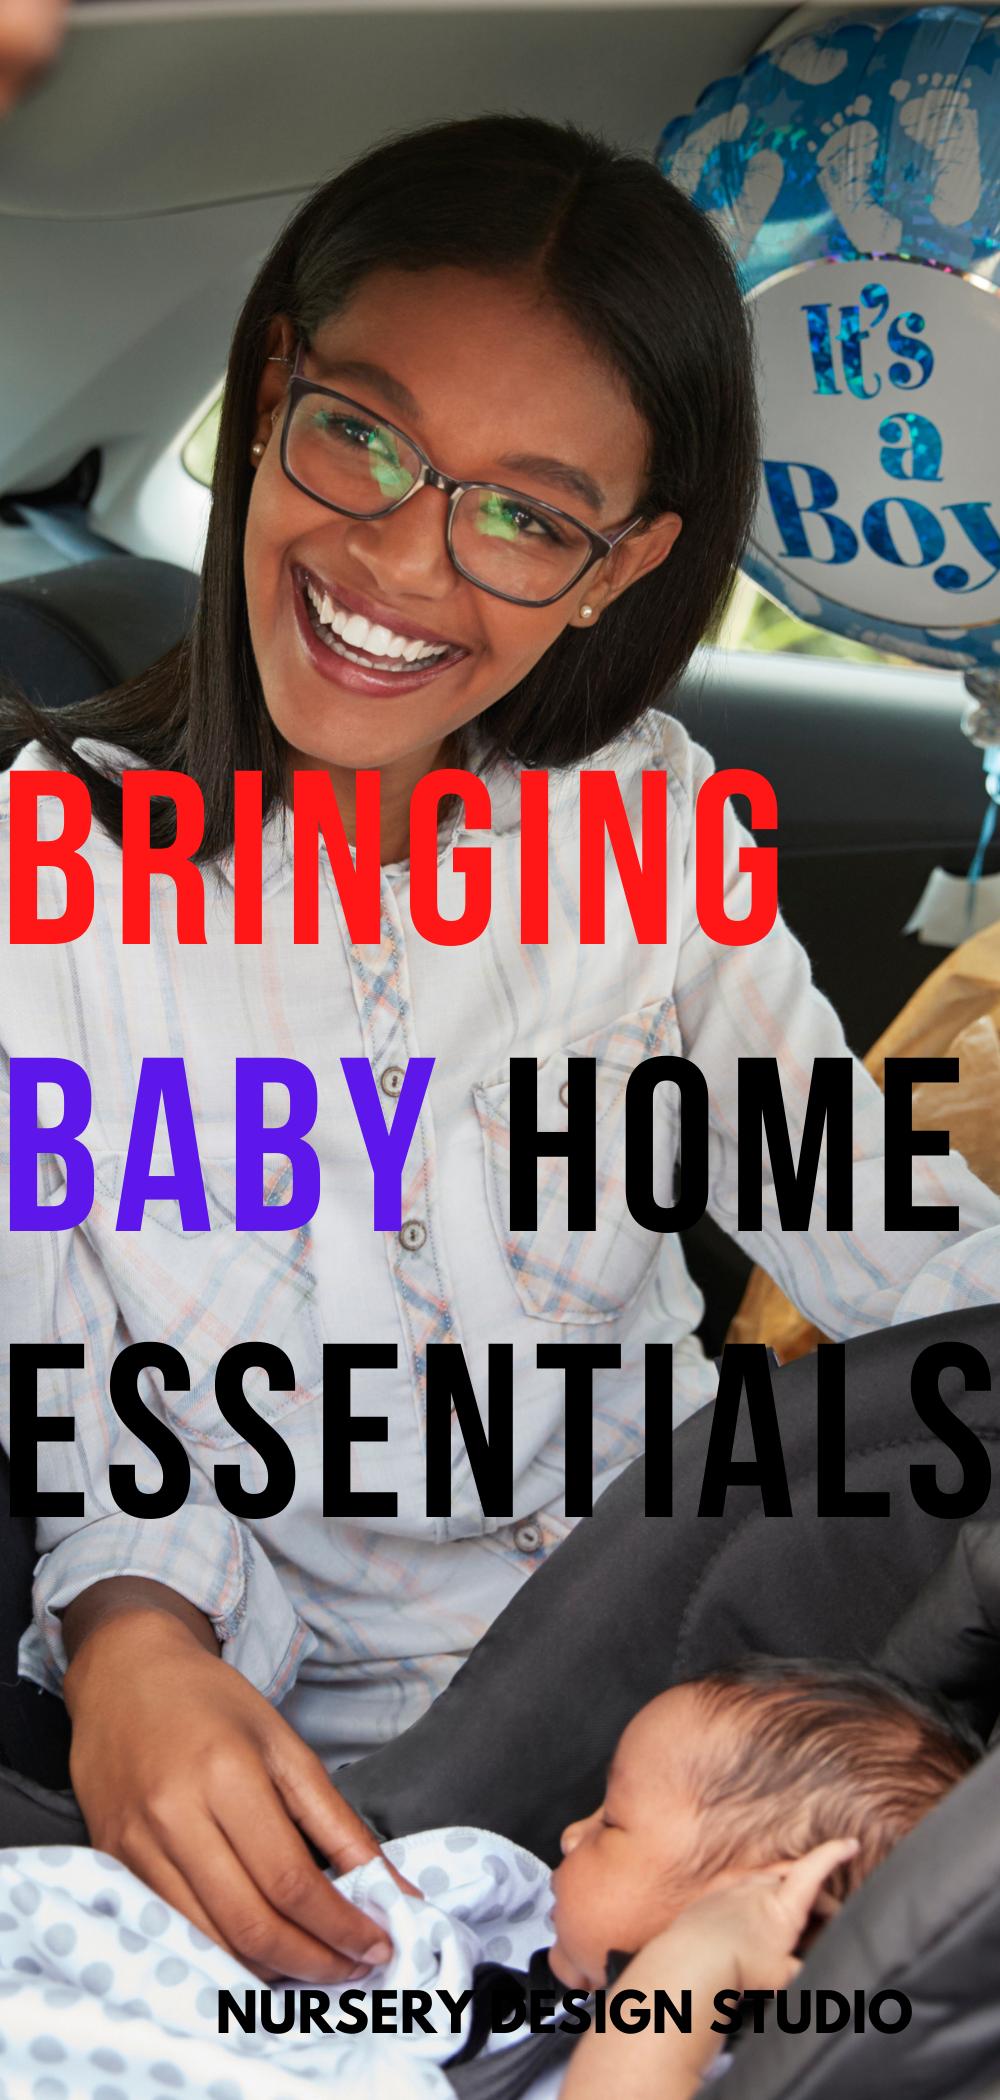 BRINGING BABY HOME ESSENTIALS